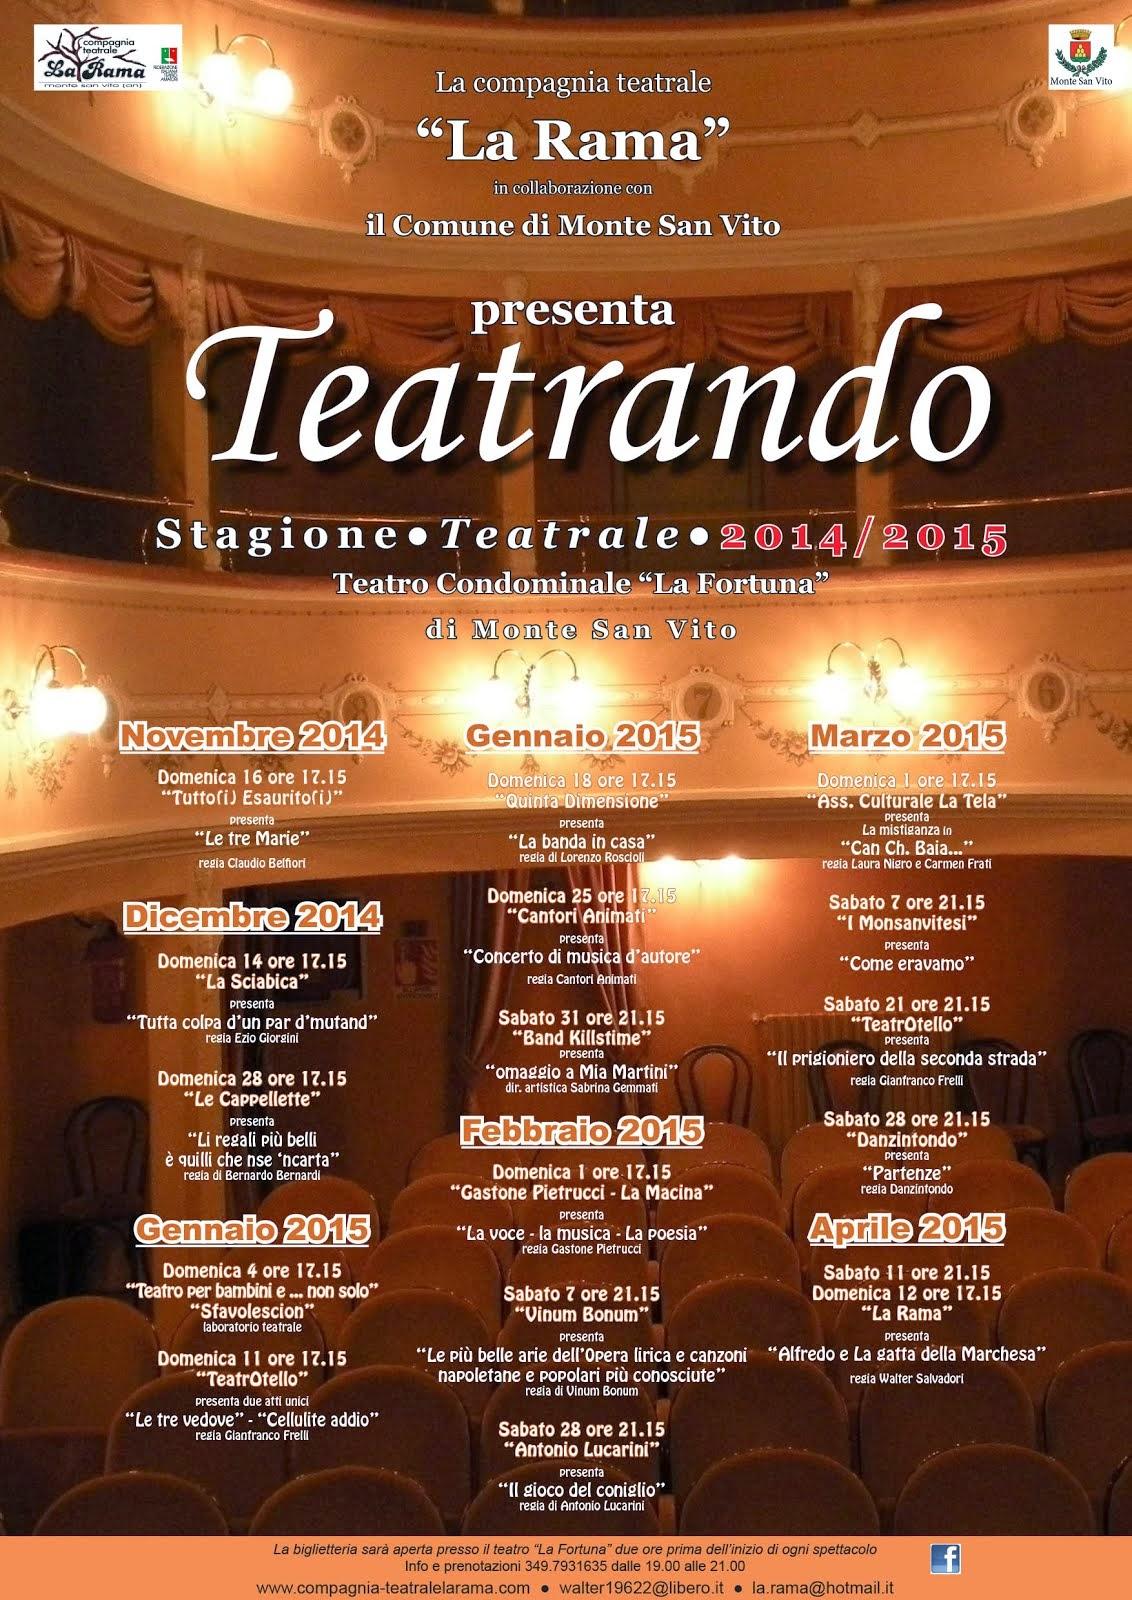 STAGIONE TEATRANDO 2014 - 2015